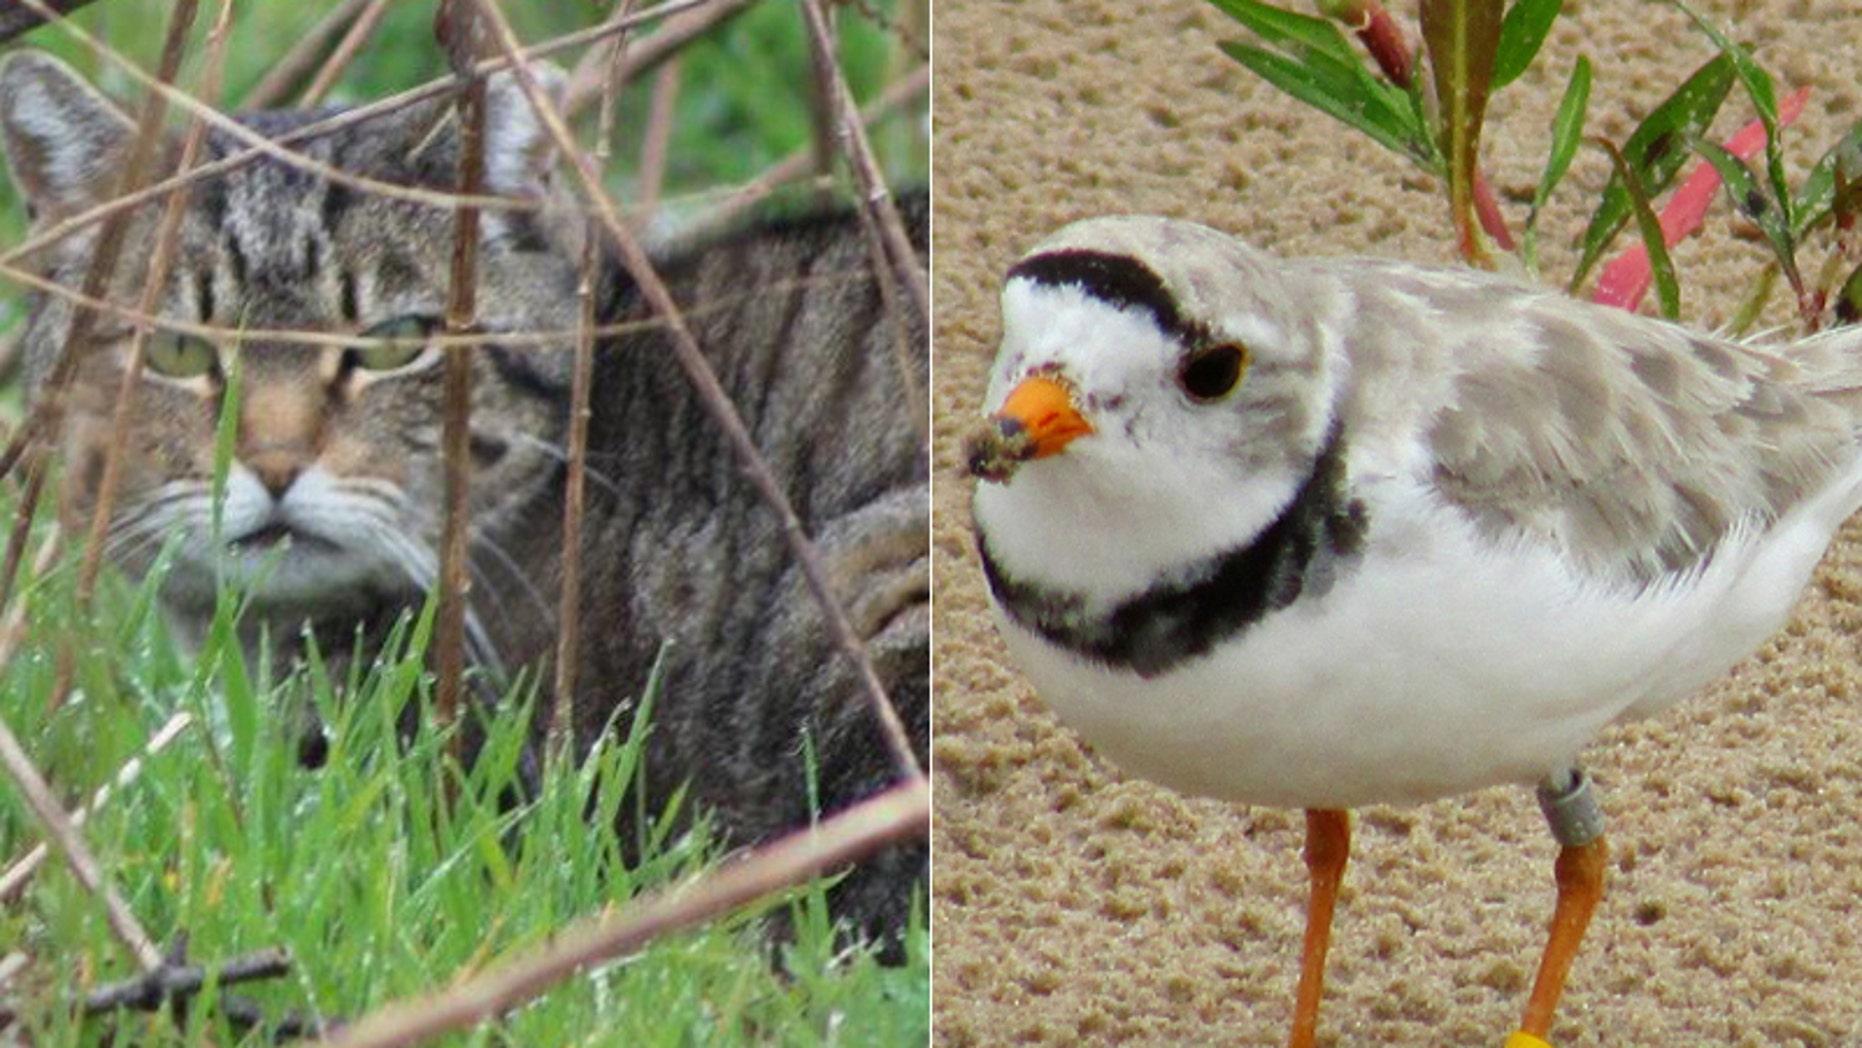 A battle is brewing on Long Island between feral cats and an endangered bird species.